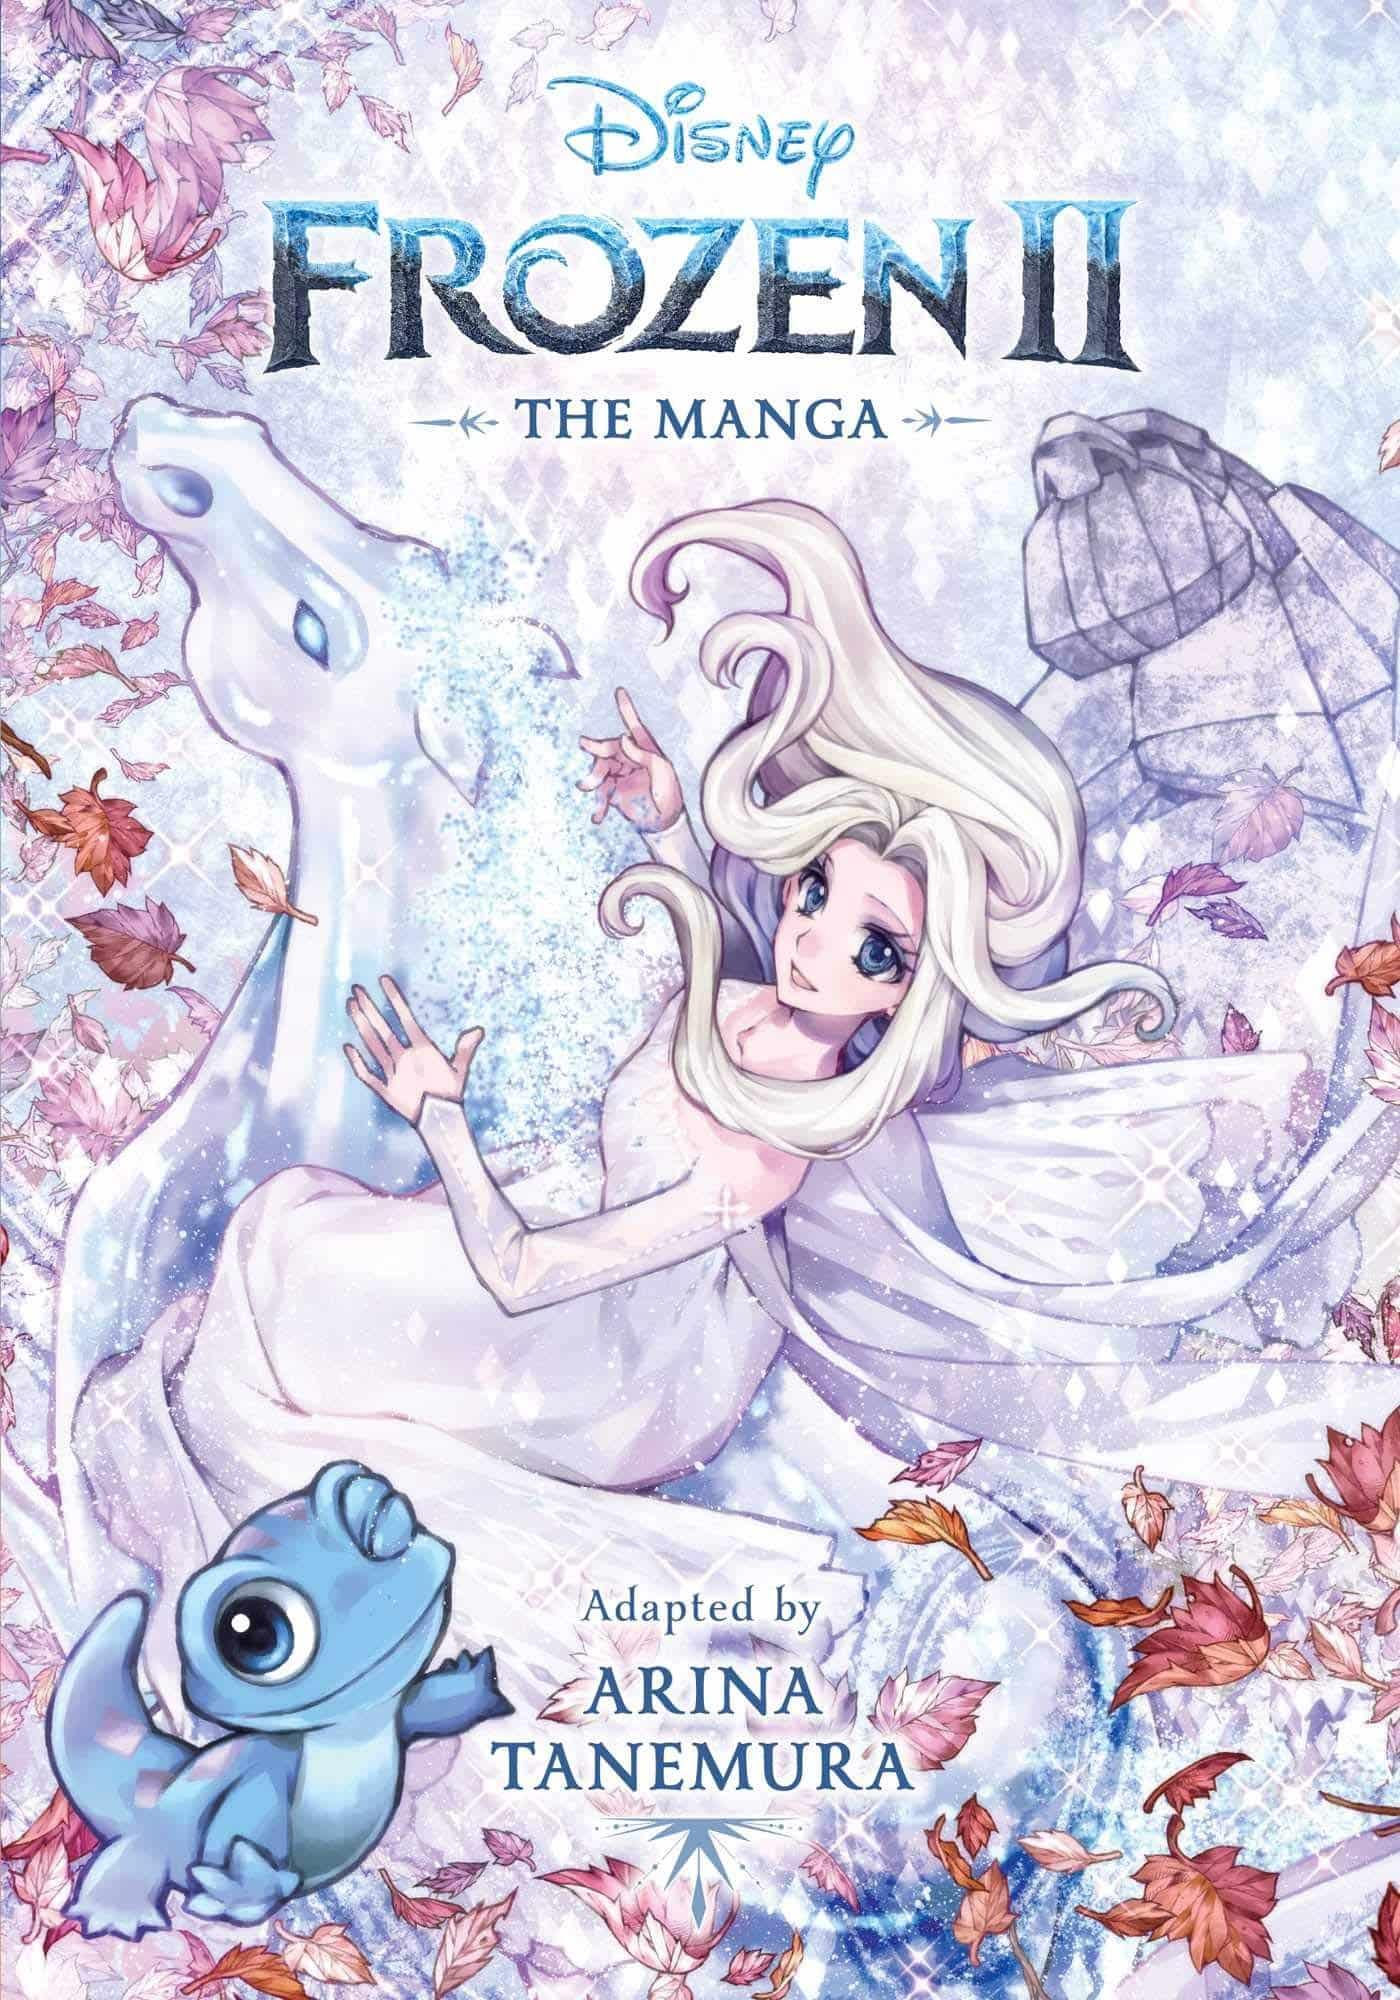 frozen 2 manga, cinematographe.it